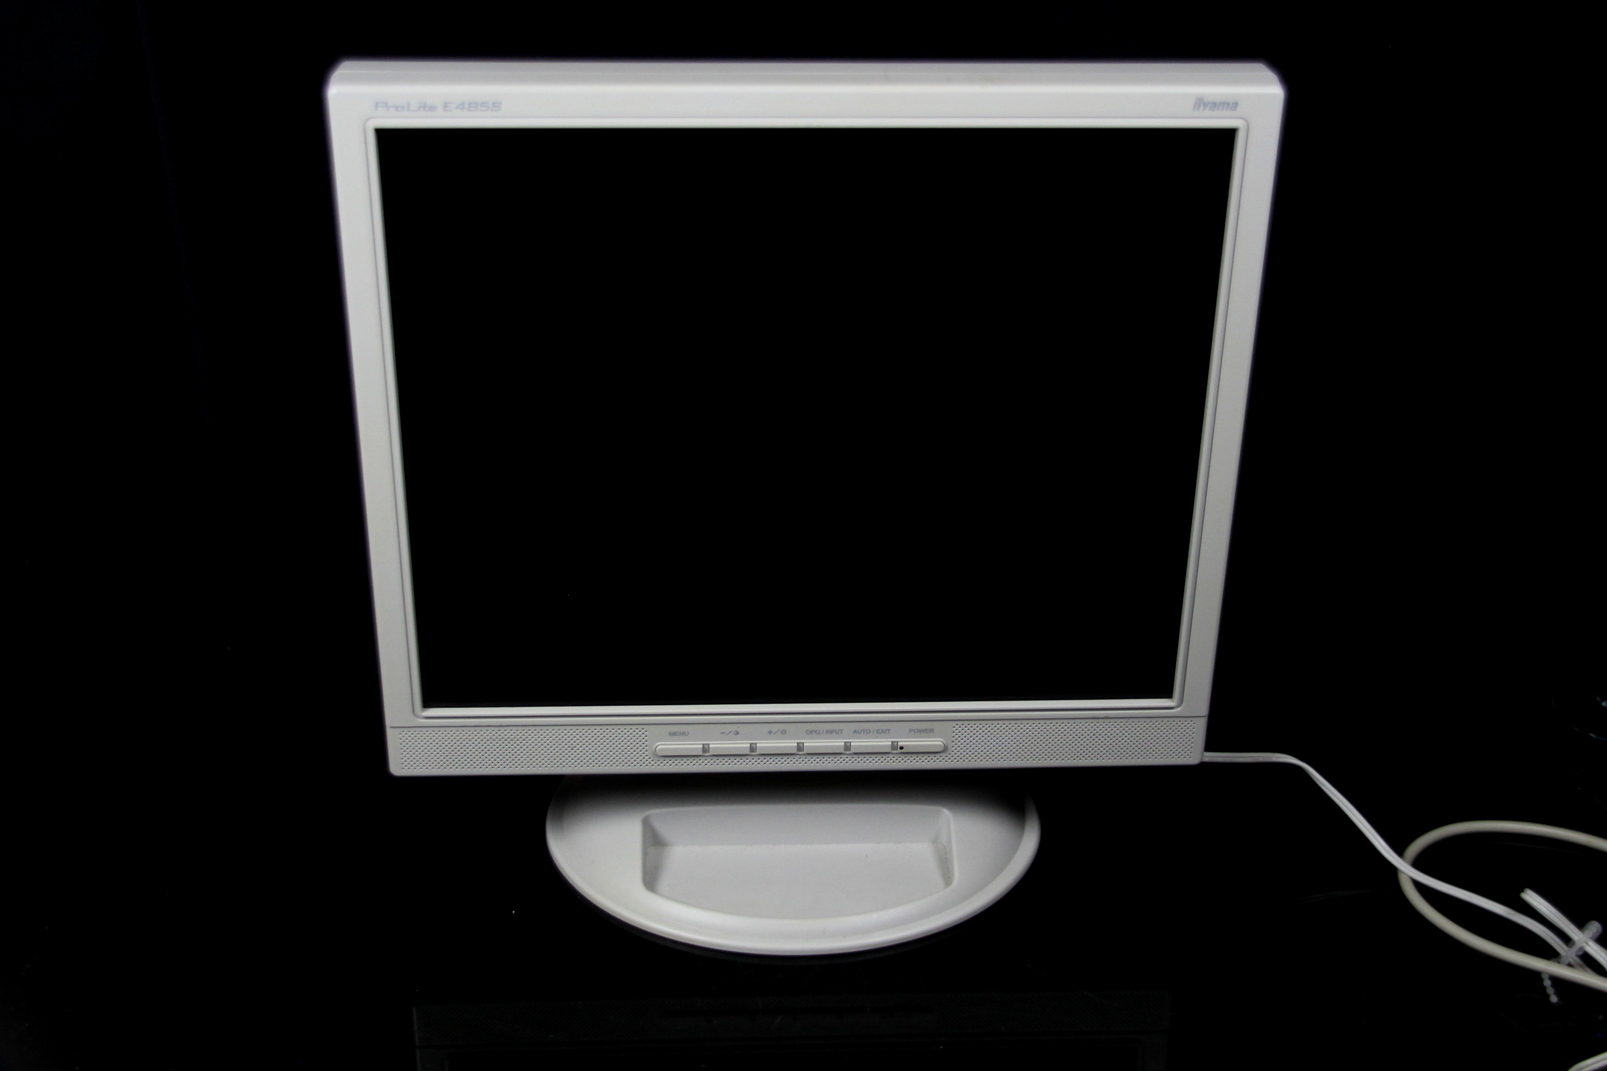 iiyama prolite e485s flachbildschirm 19 bildschirm dvi. Black Bedroom Furniture Sets. Home Design Ideas